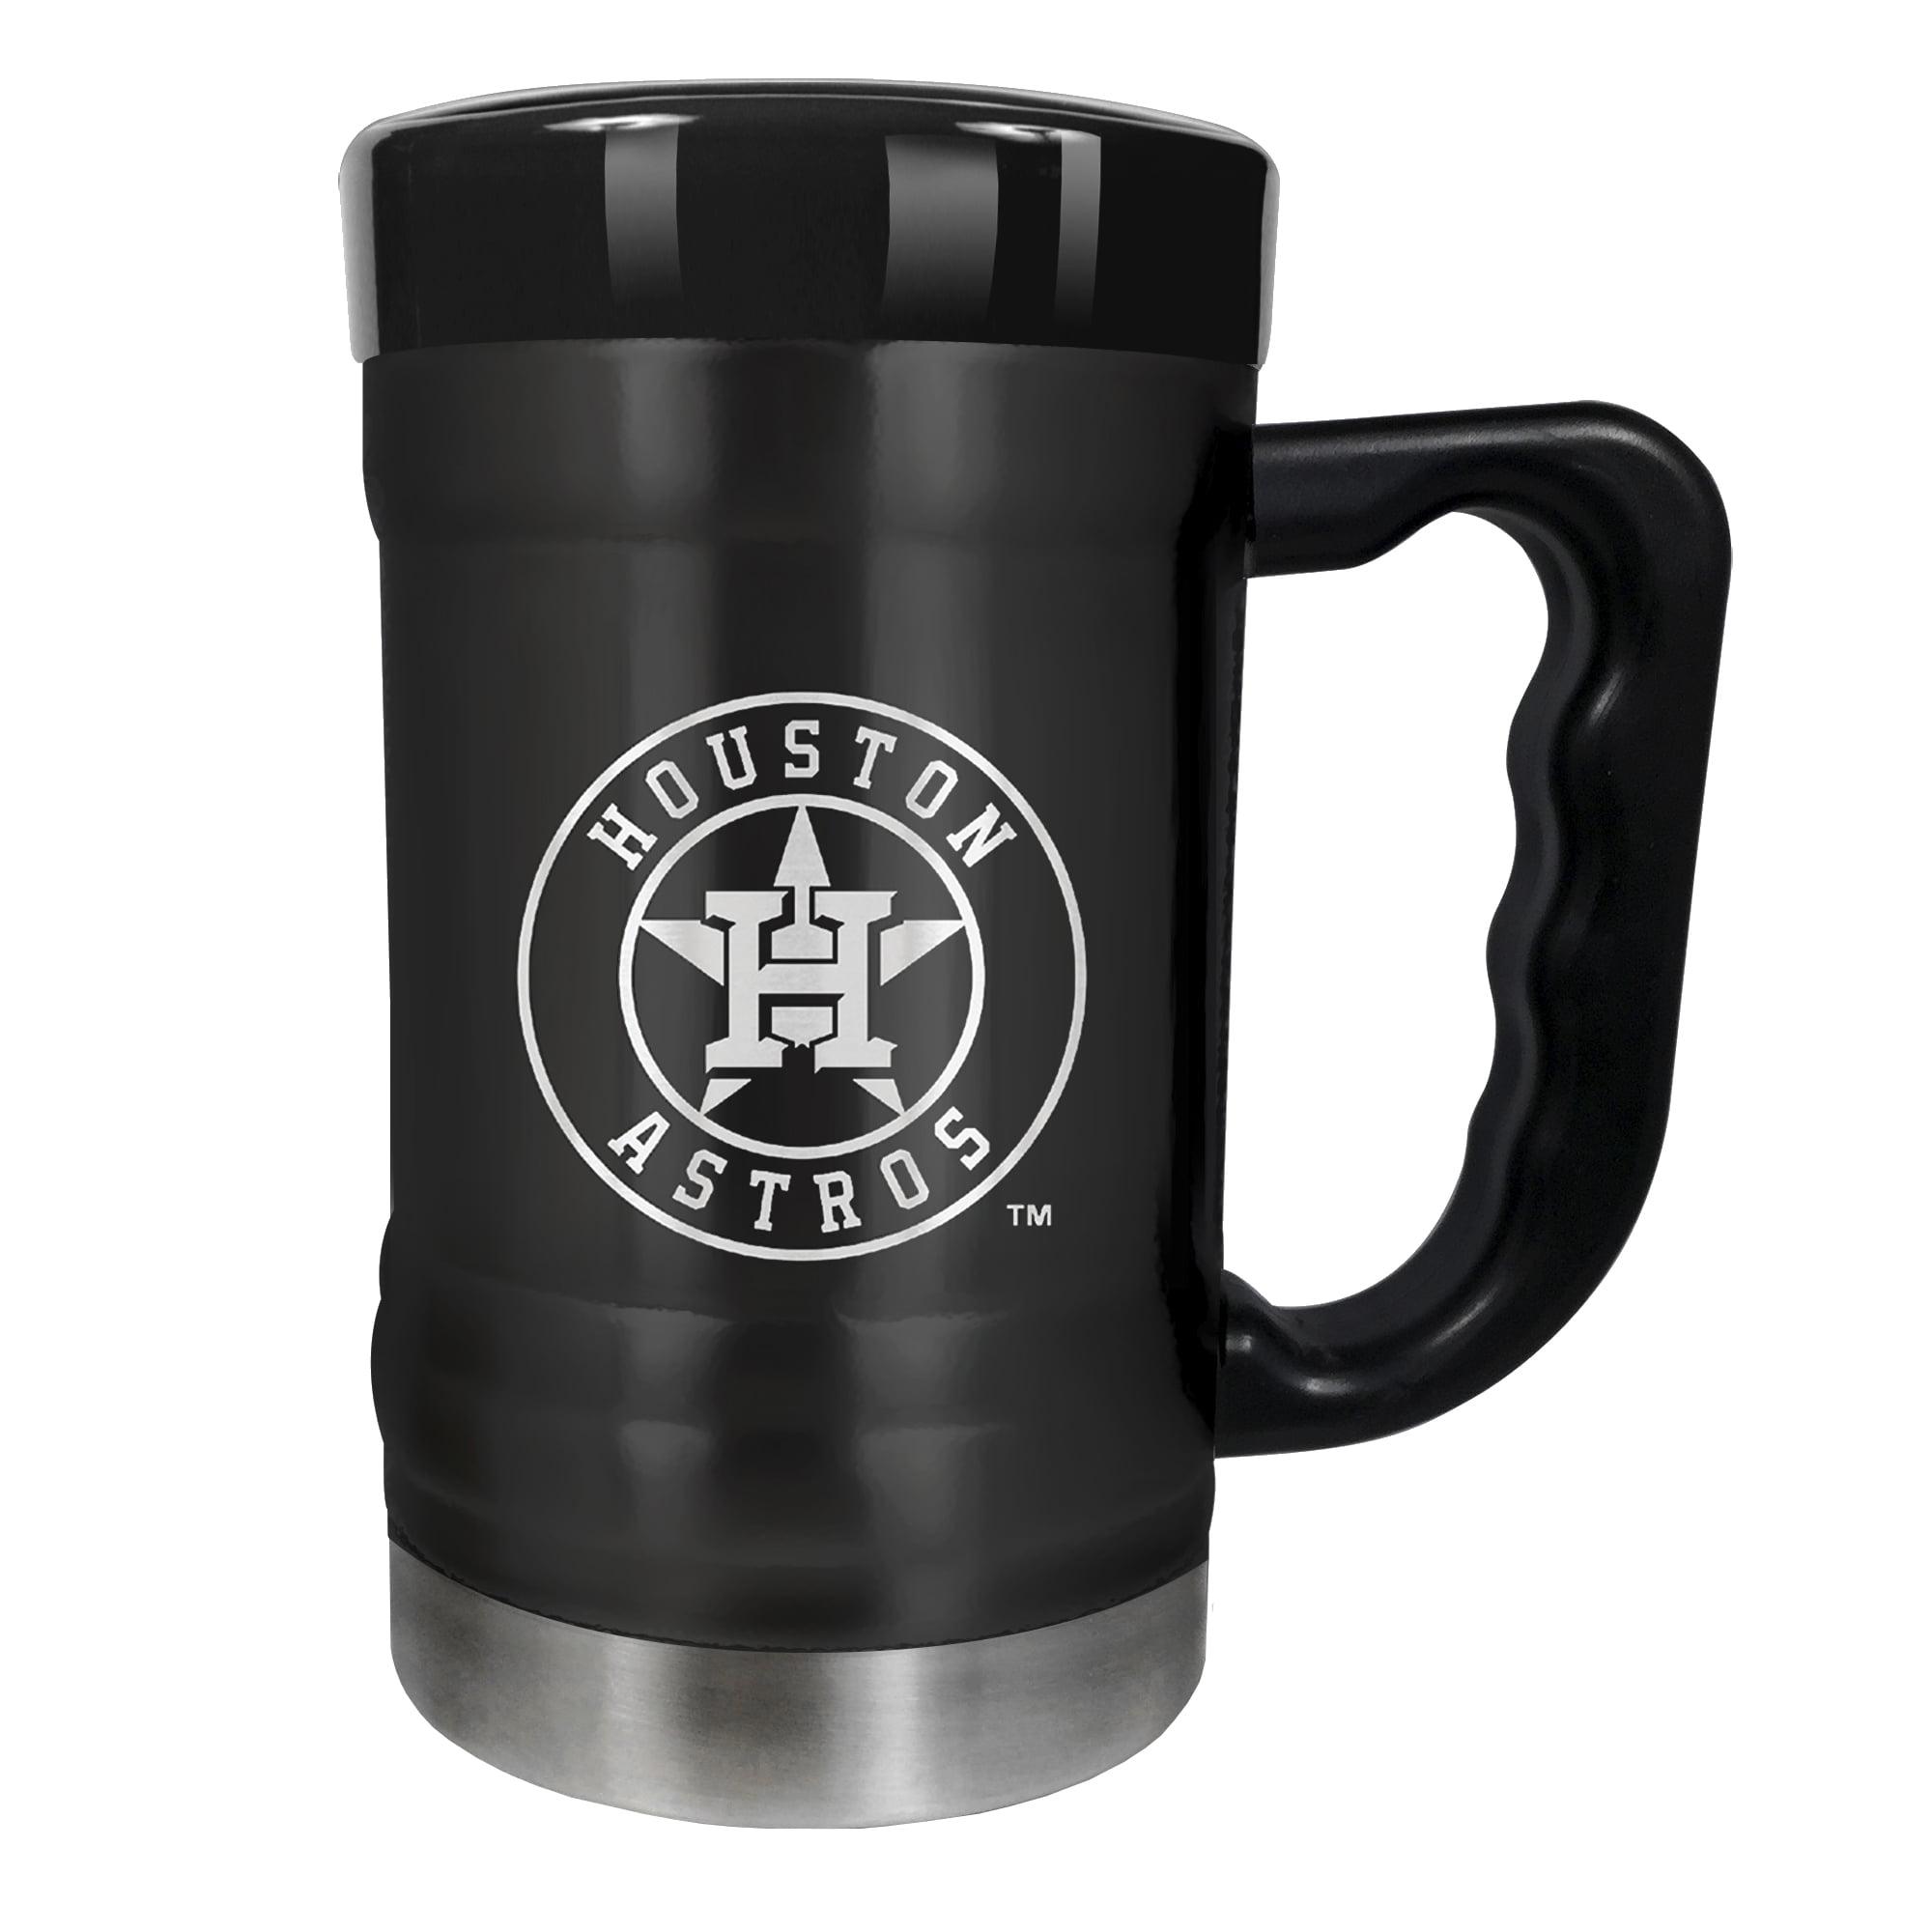 Houston Astros 15oz. Stealth Coach Coffee Mug - Black - No Size